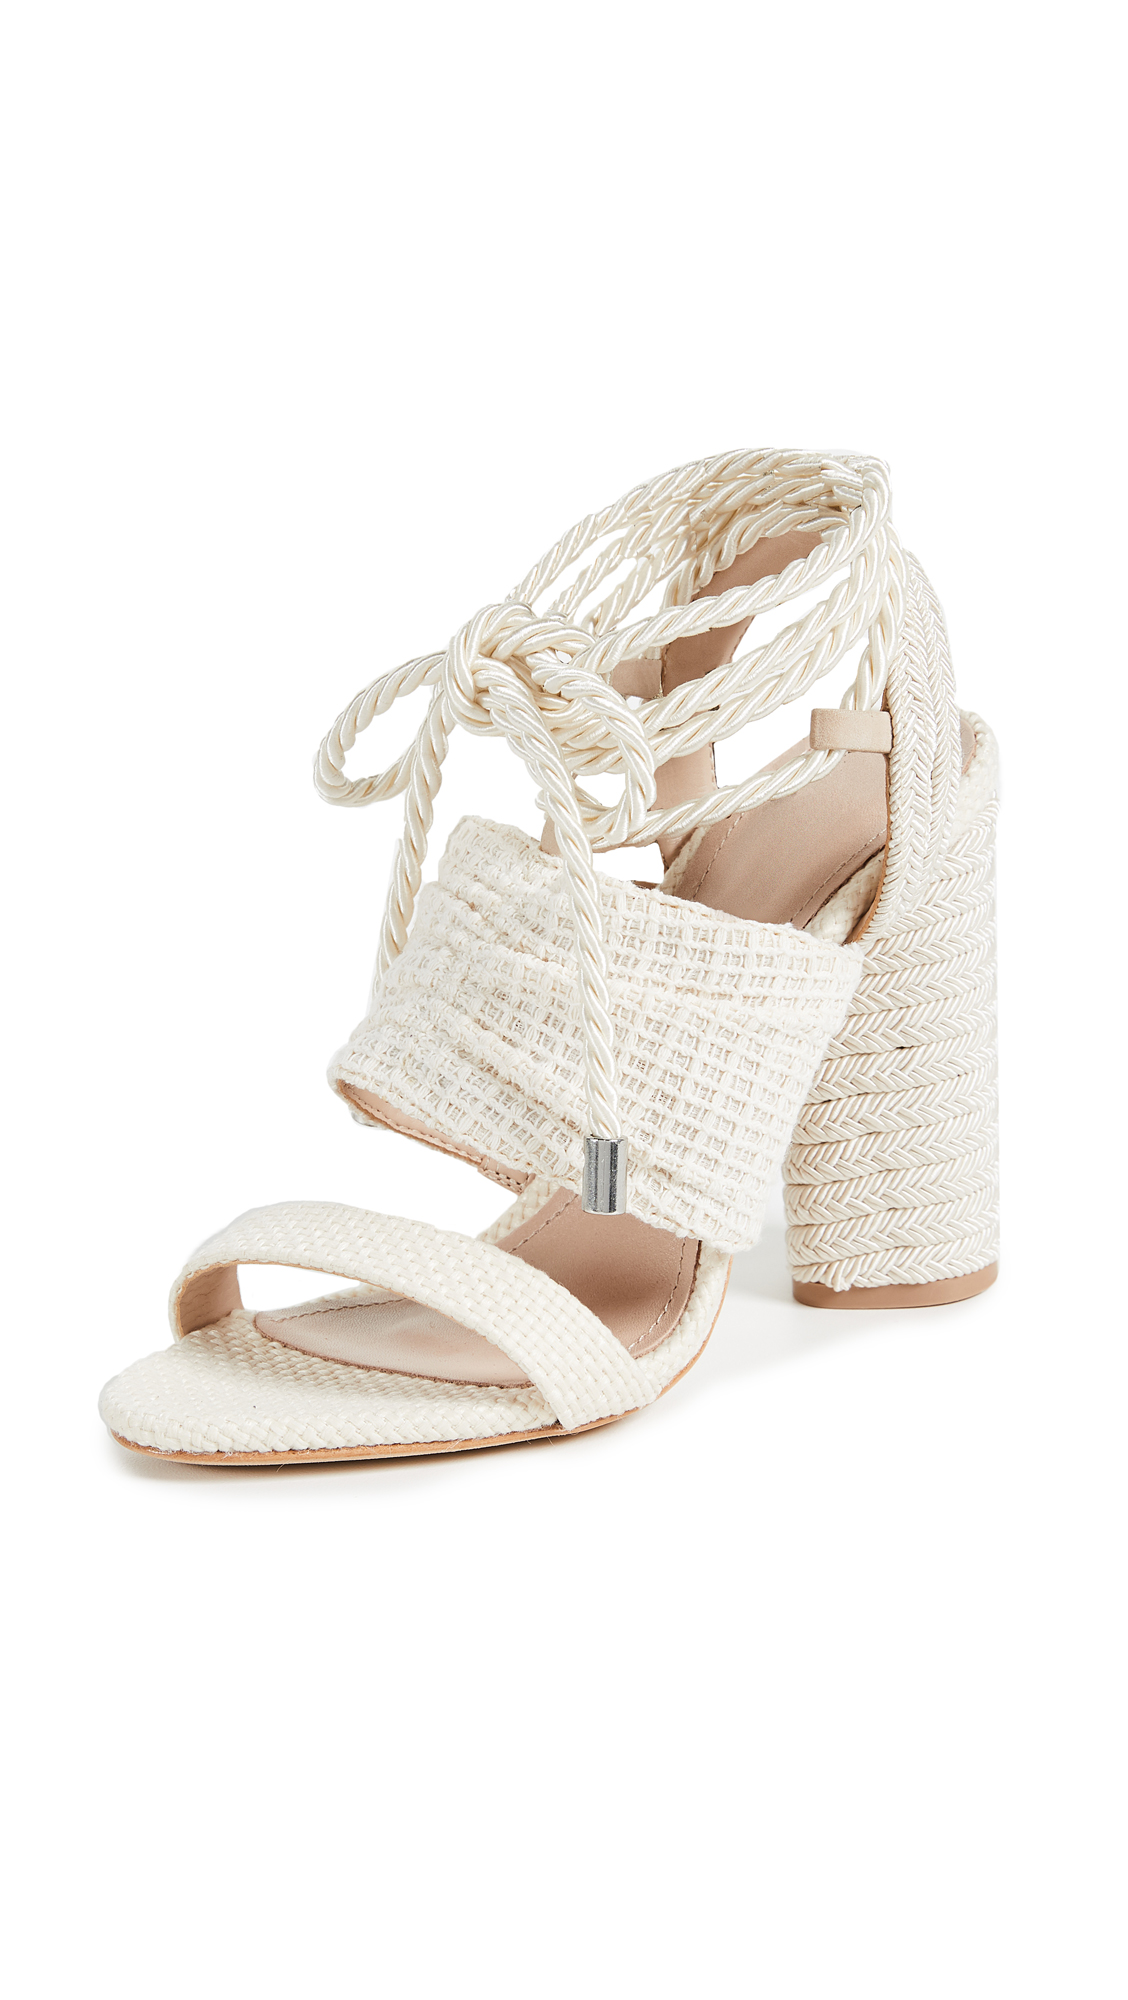 Schutz Lenice Strappy Sandals - Cru/Pearl